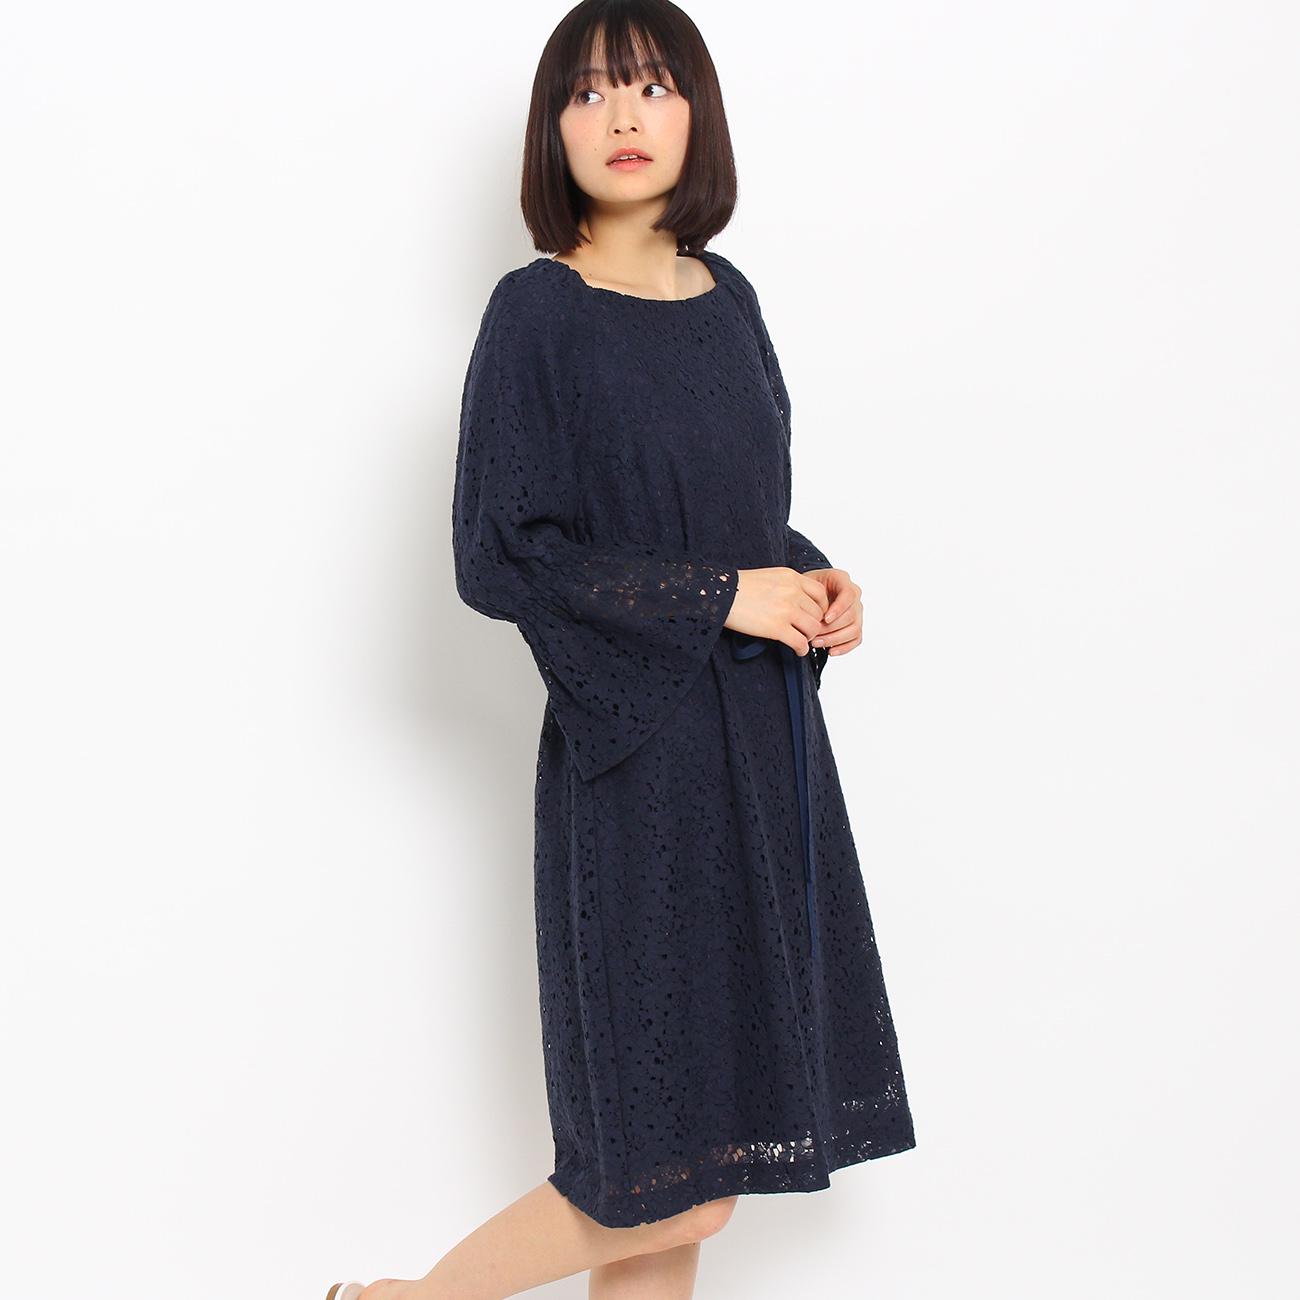 【Couture brooch (クチュールブローチ)】【WEB限定プライス】フレアスリーブレースワンピースレディース ワンピース|ワンピース ブルー系